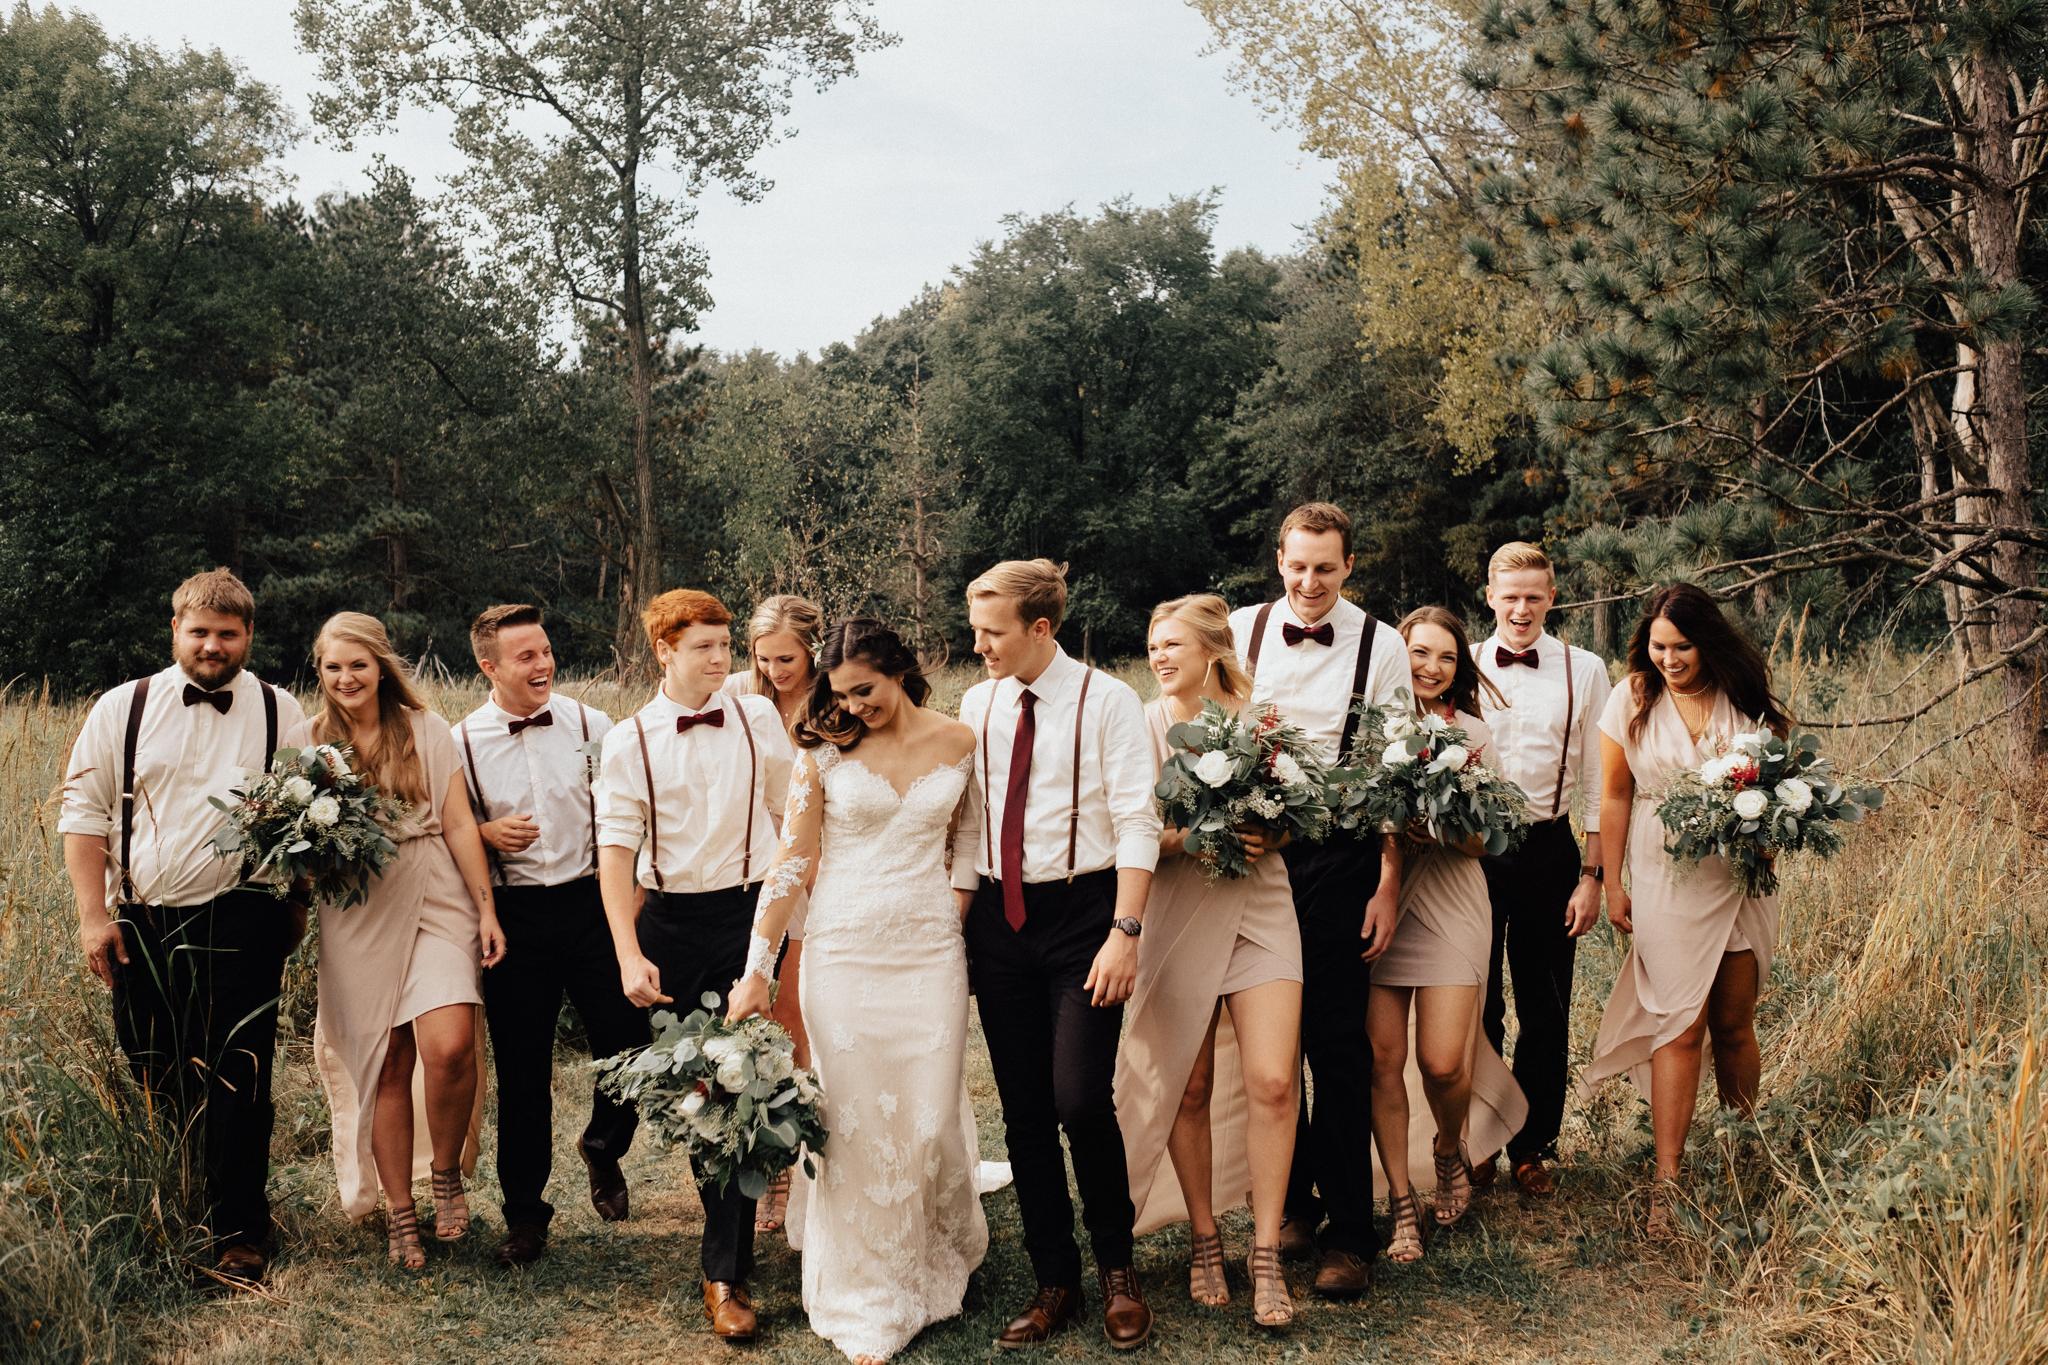 Arizona-Adventure-Elopement-Wedding-Photographer-77.jpg